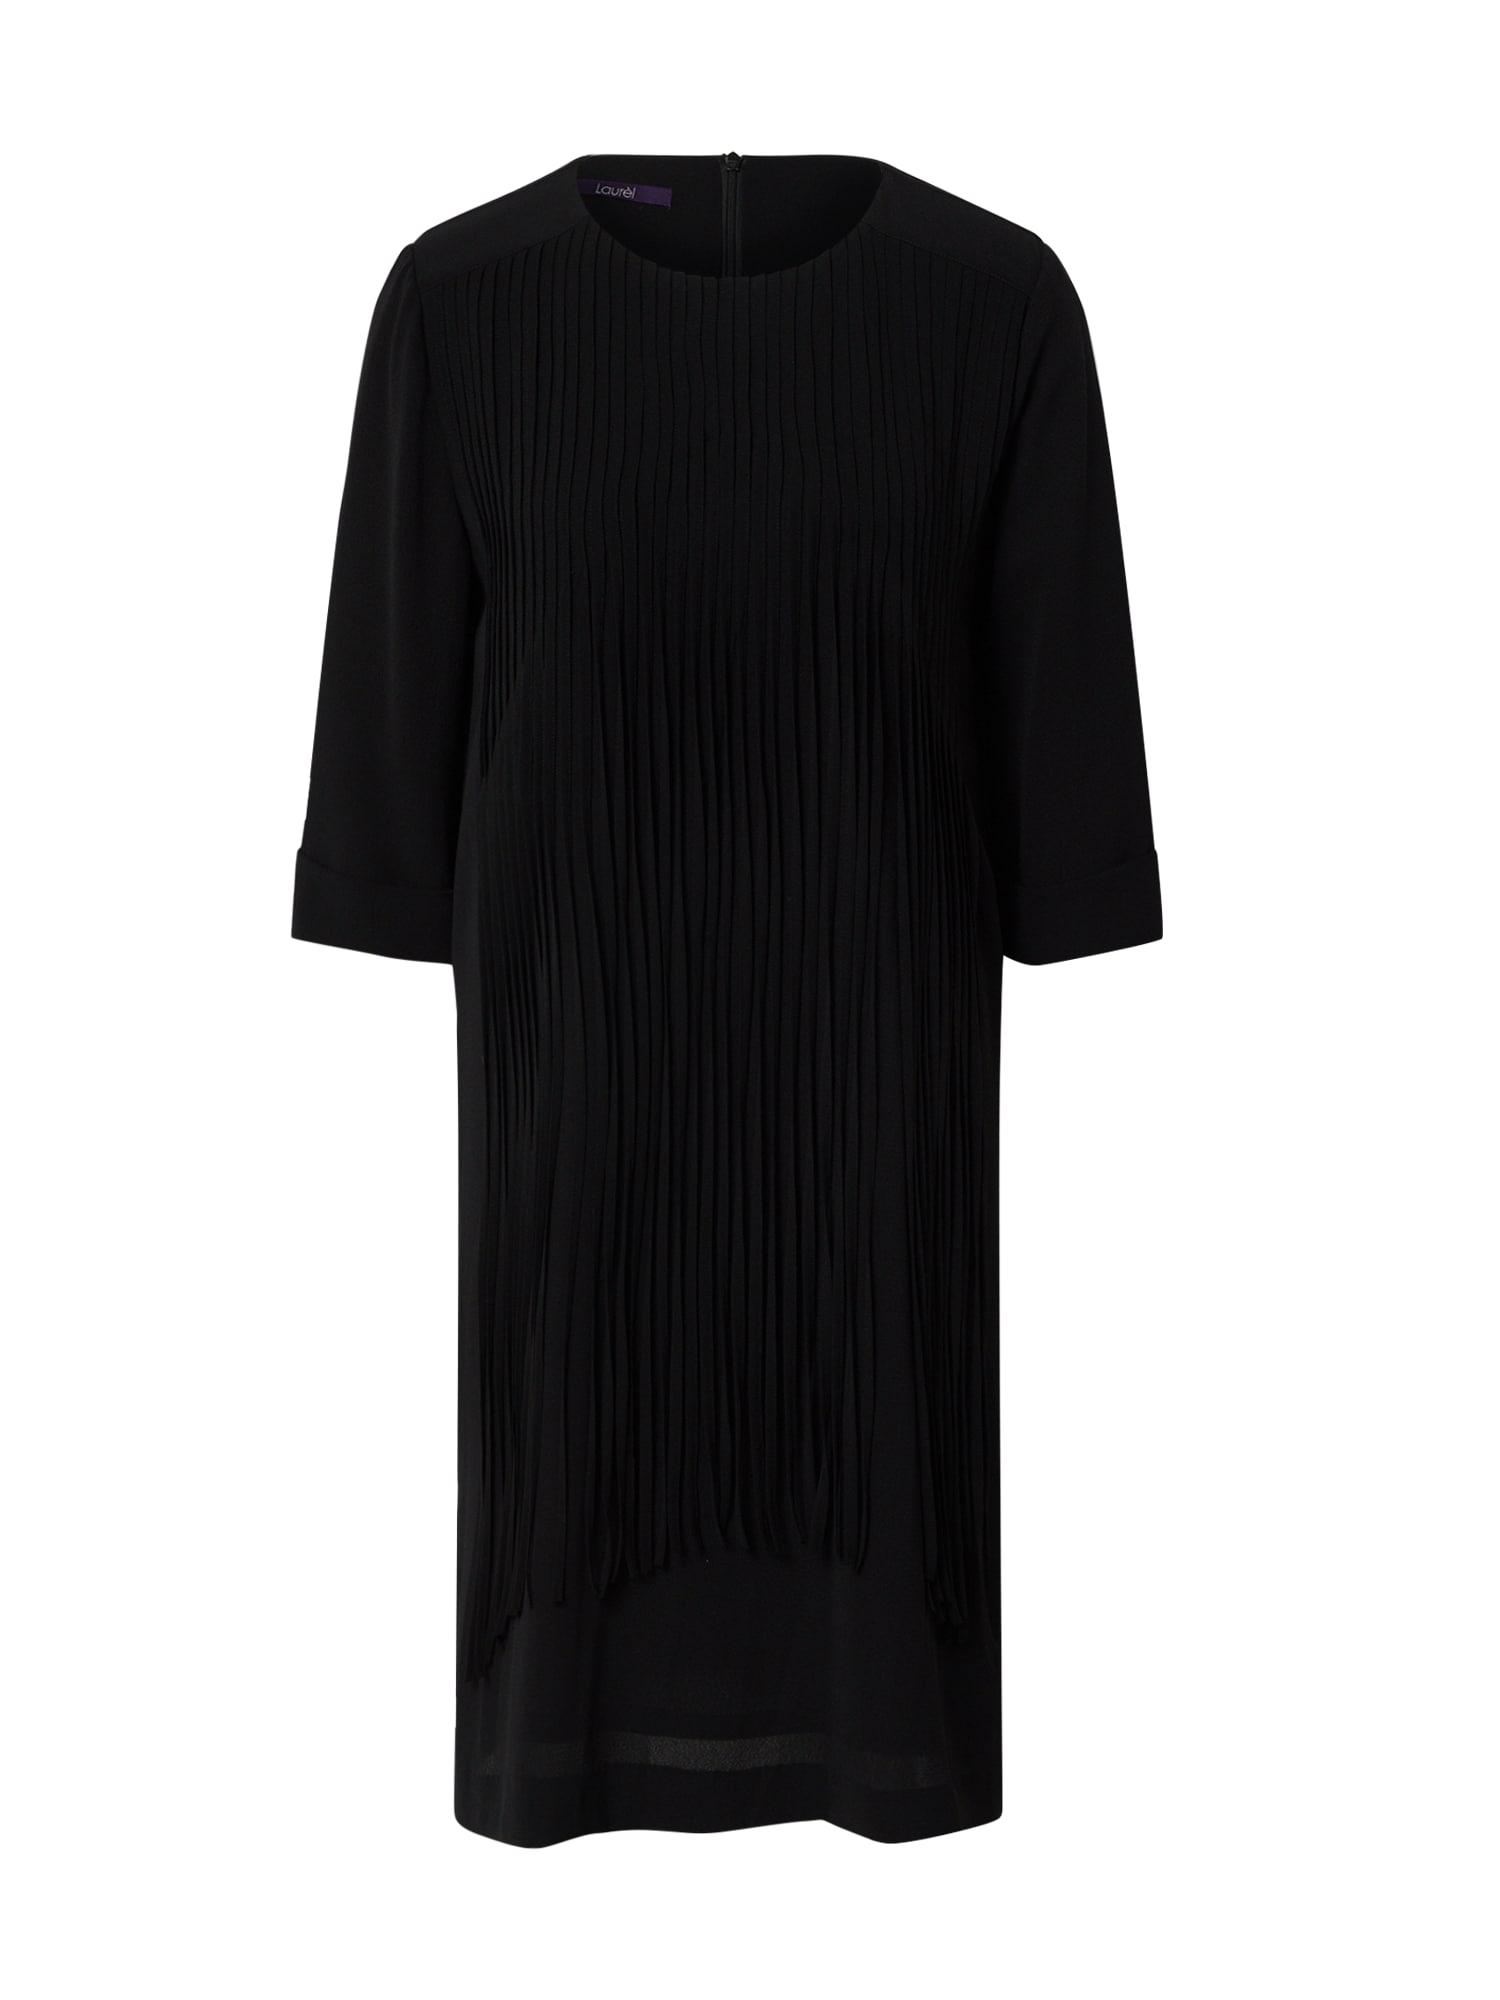 LAUREL Suknelė juoda